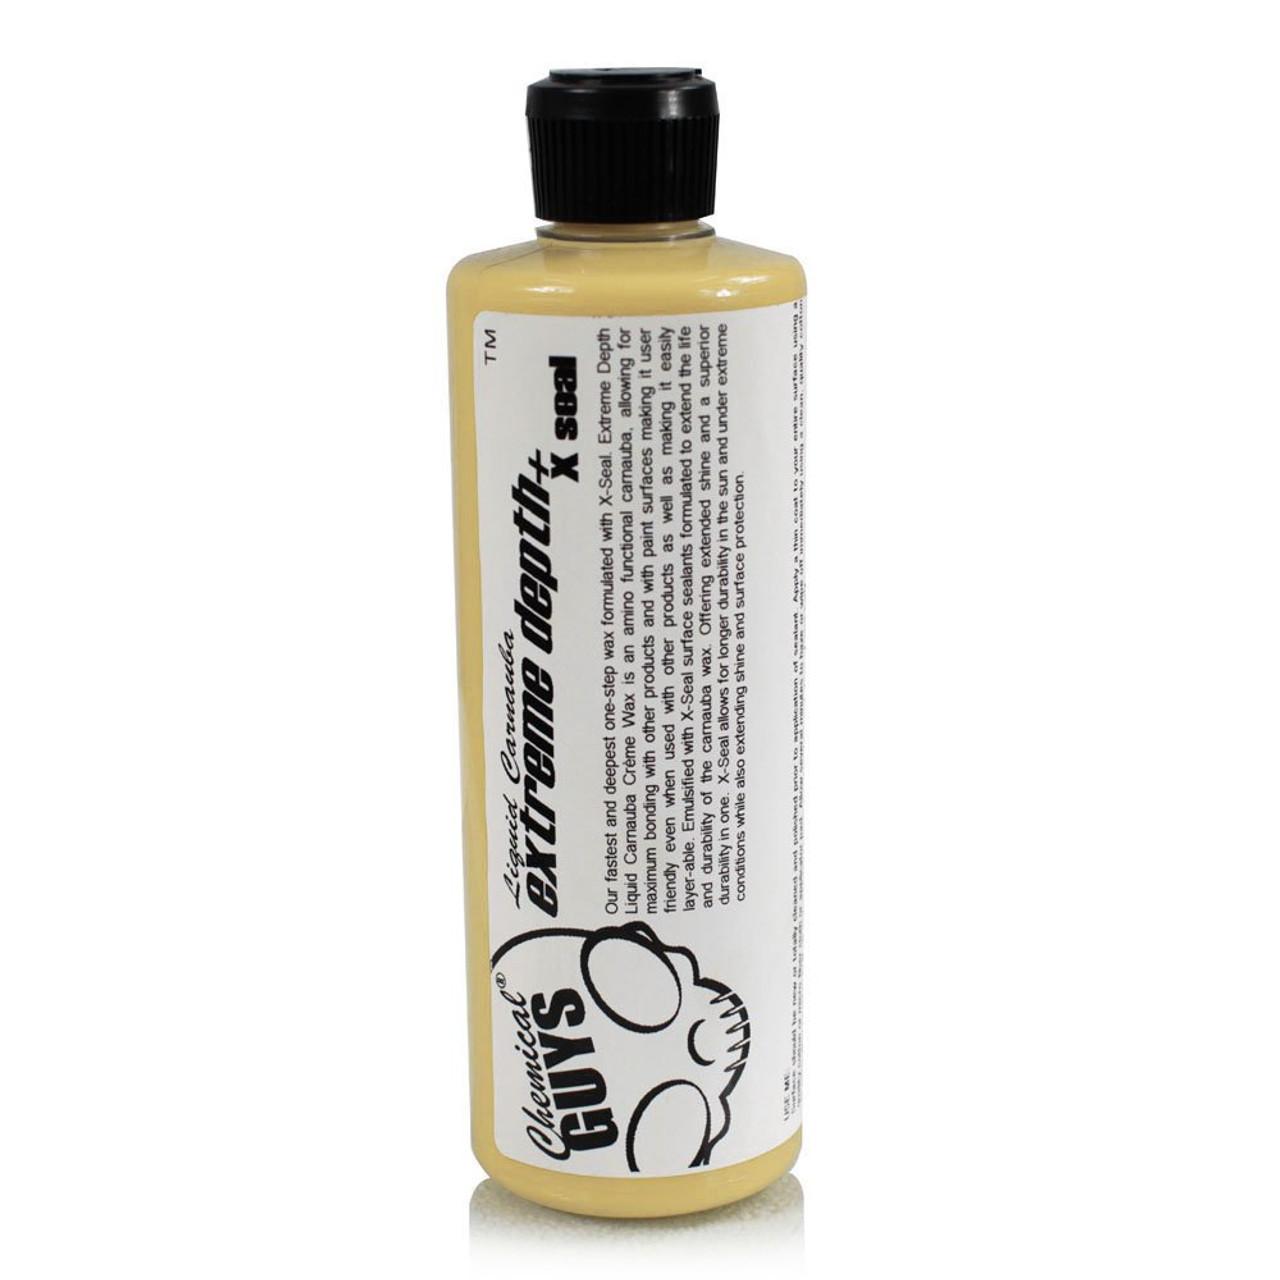 Extreme Depth Liquid Carnauba Creme Wax + X-Seal (16 oz)